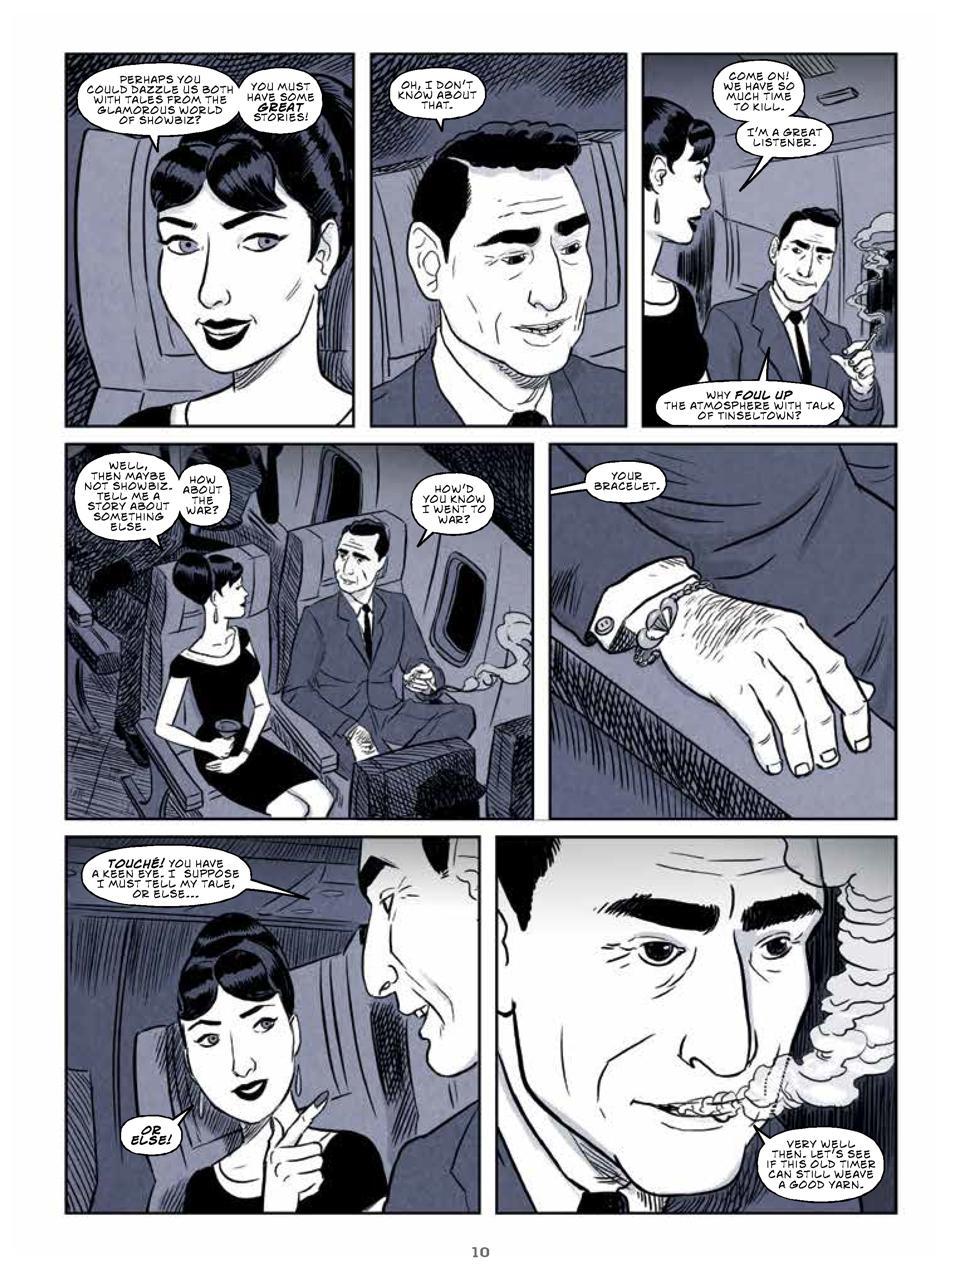 Twilight Man